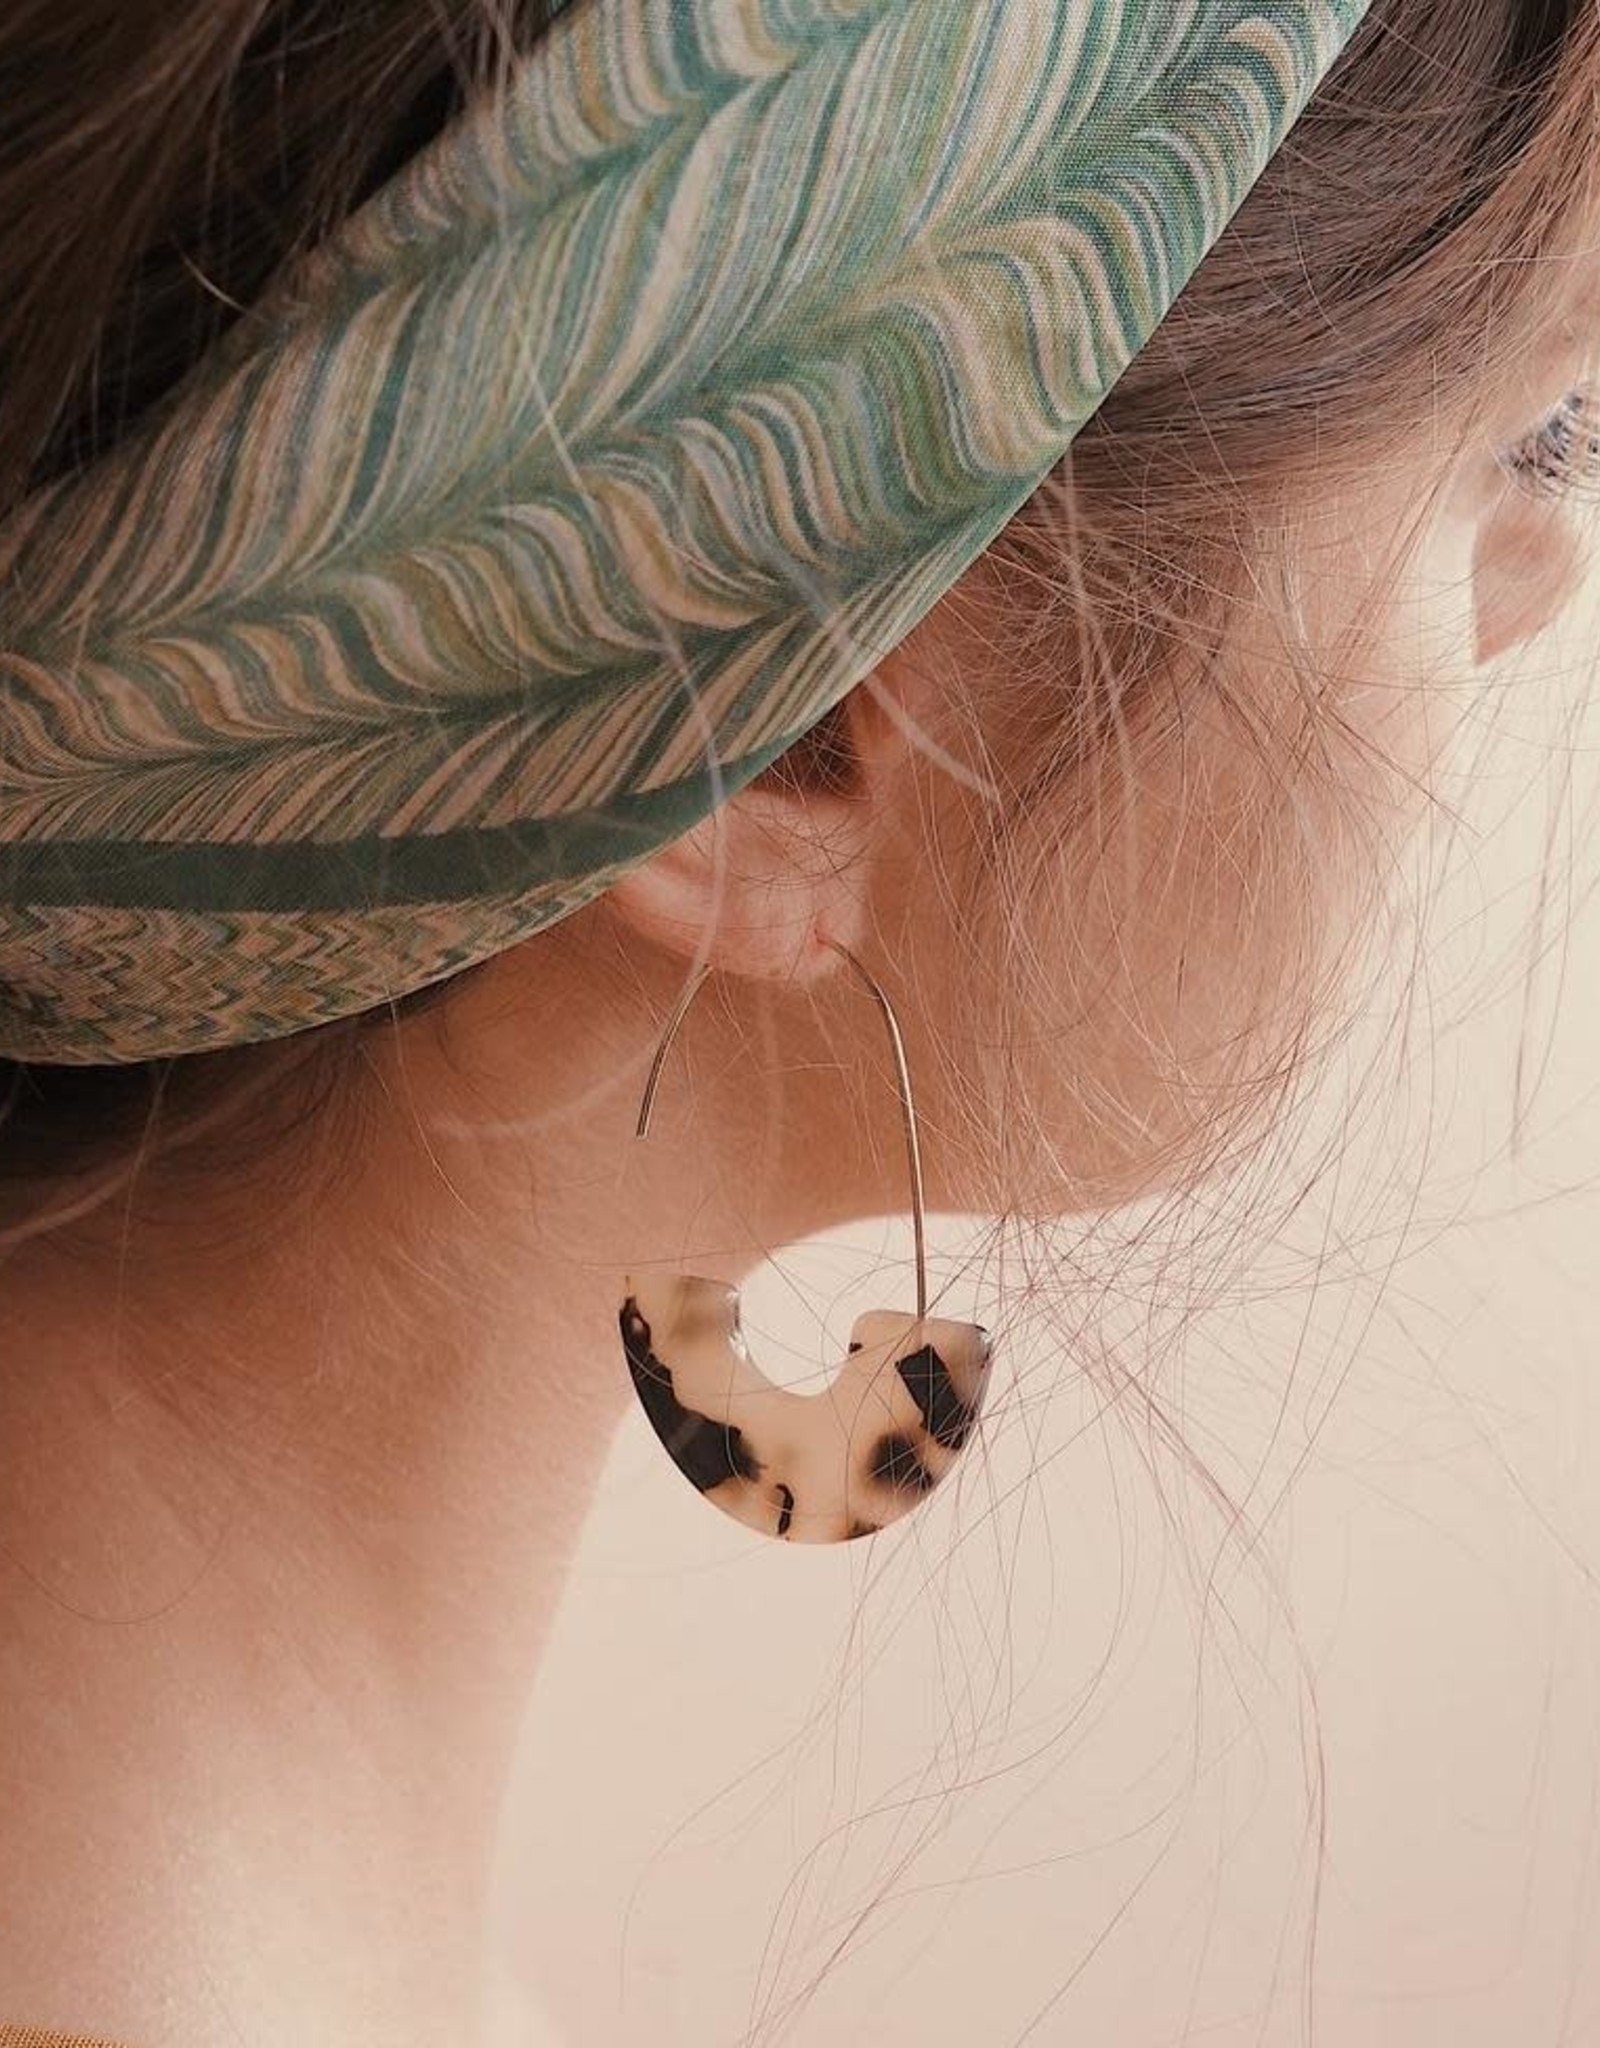 Vayu Jewels Zeta Earrings - Rosa